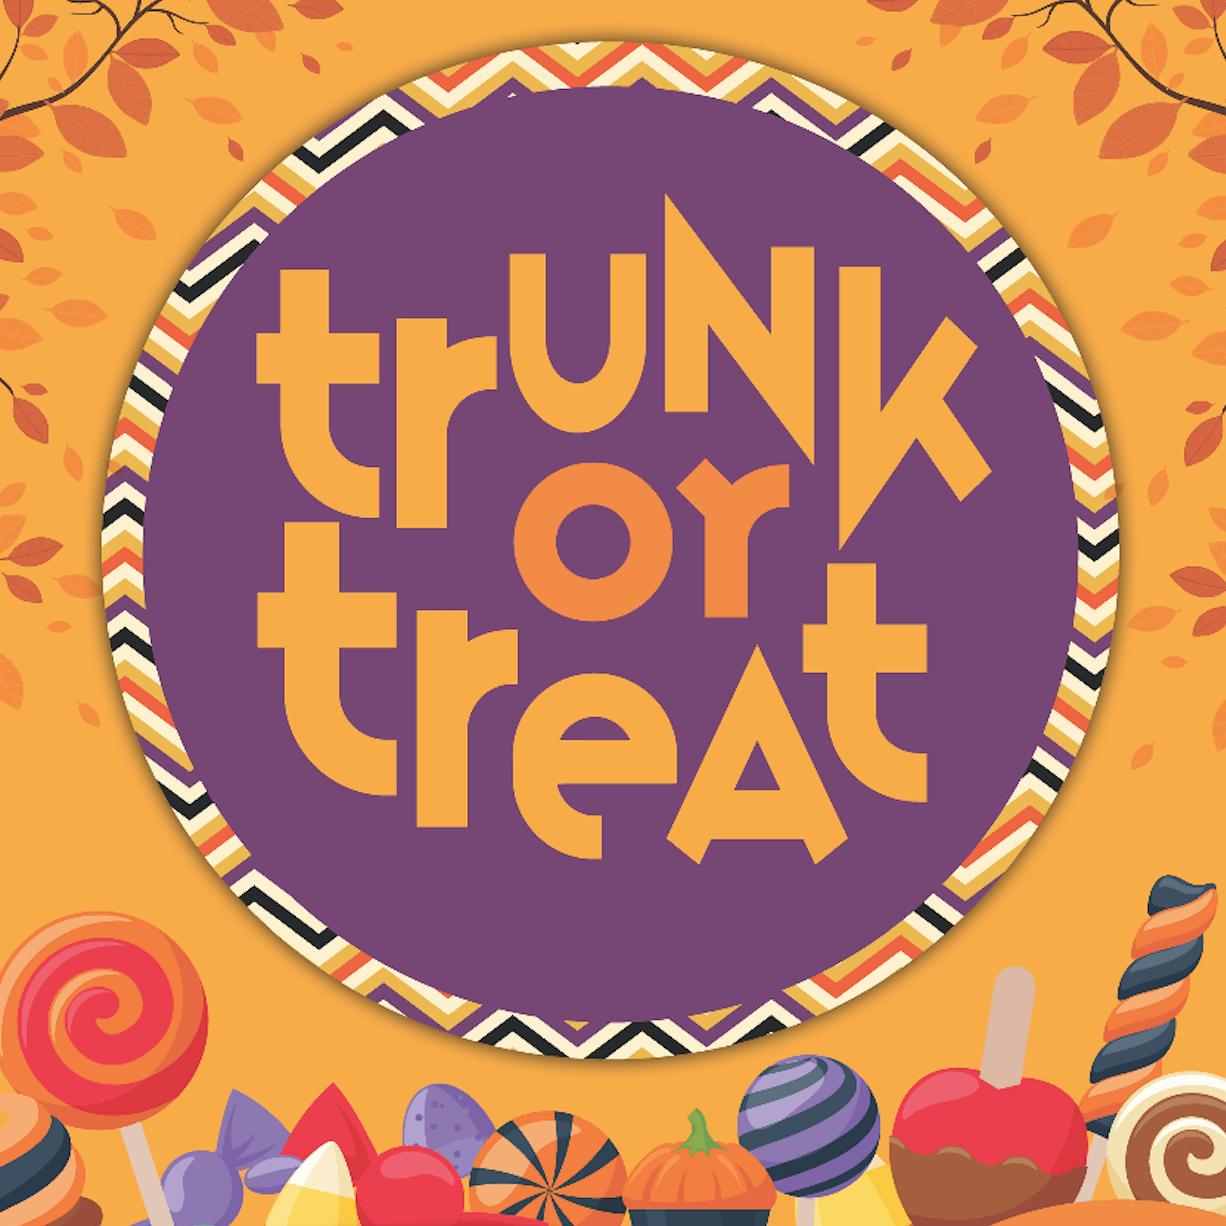 Trunk or treat sq